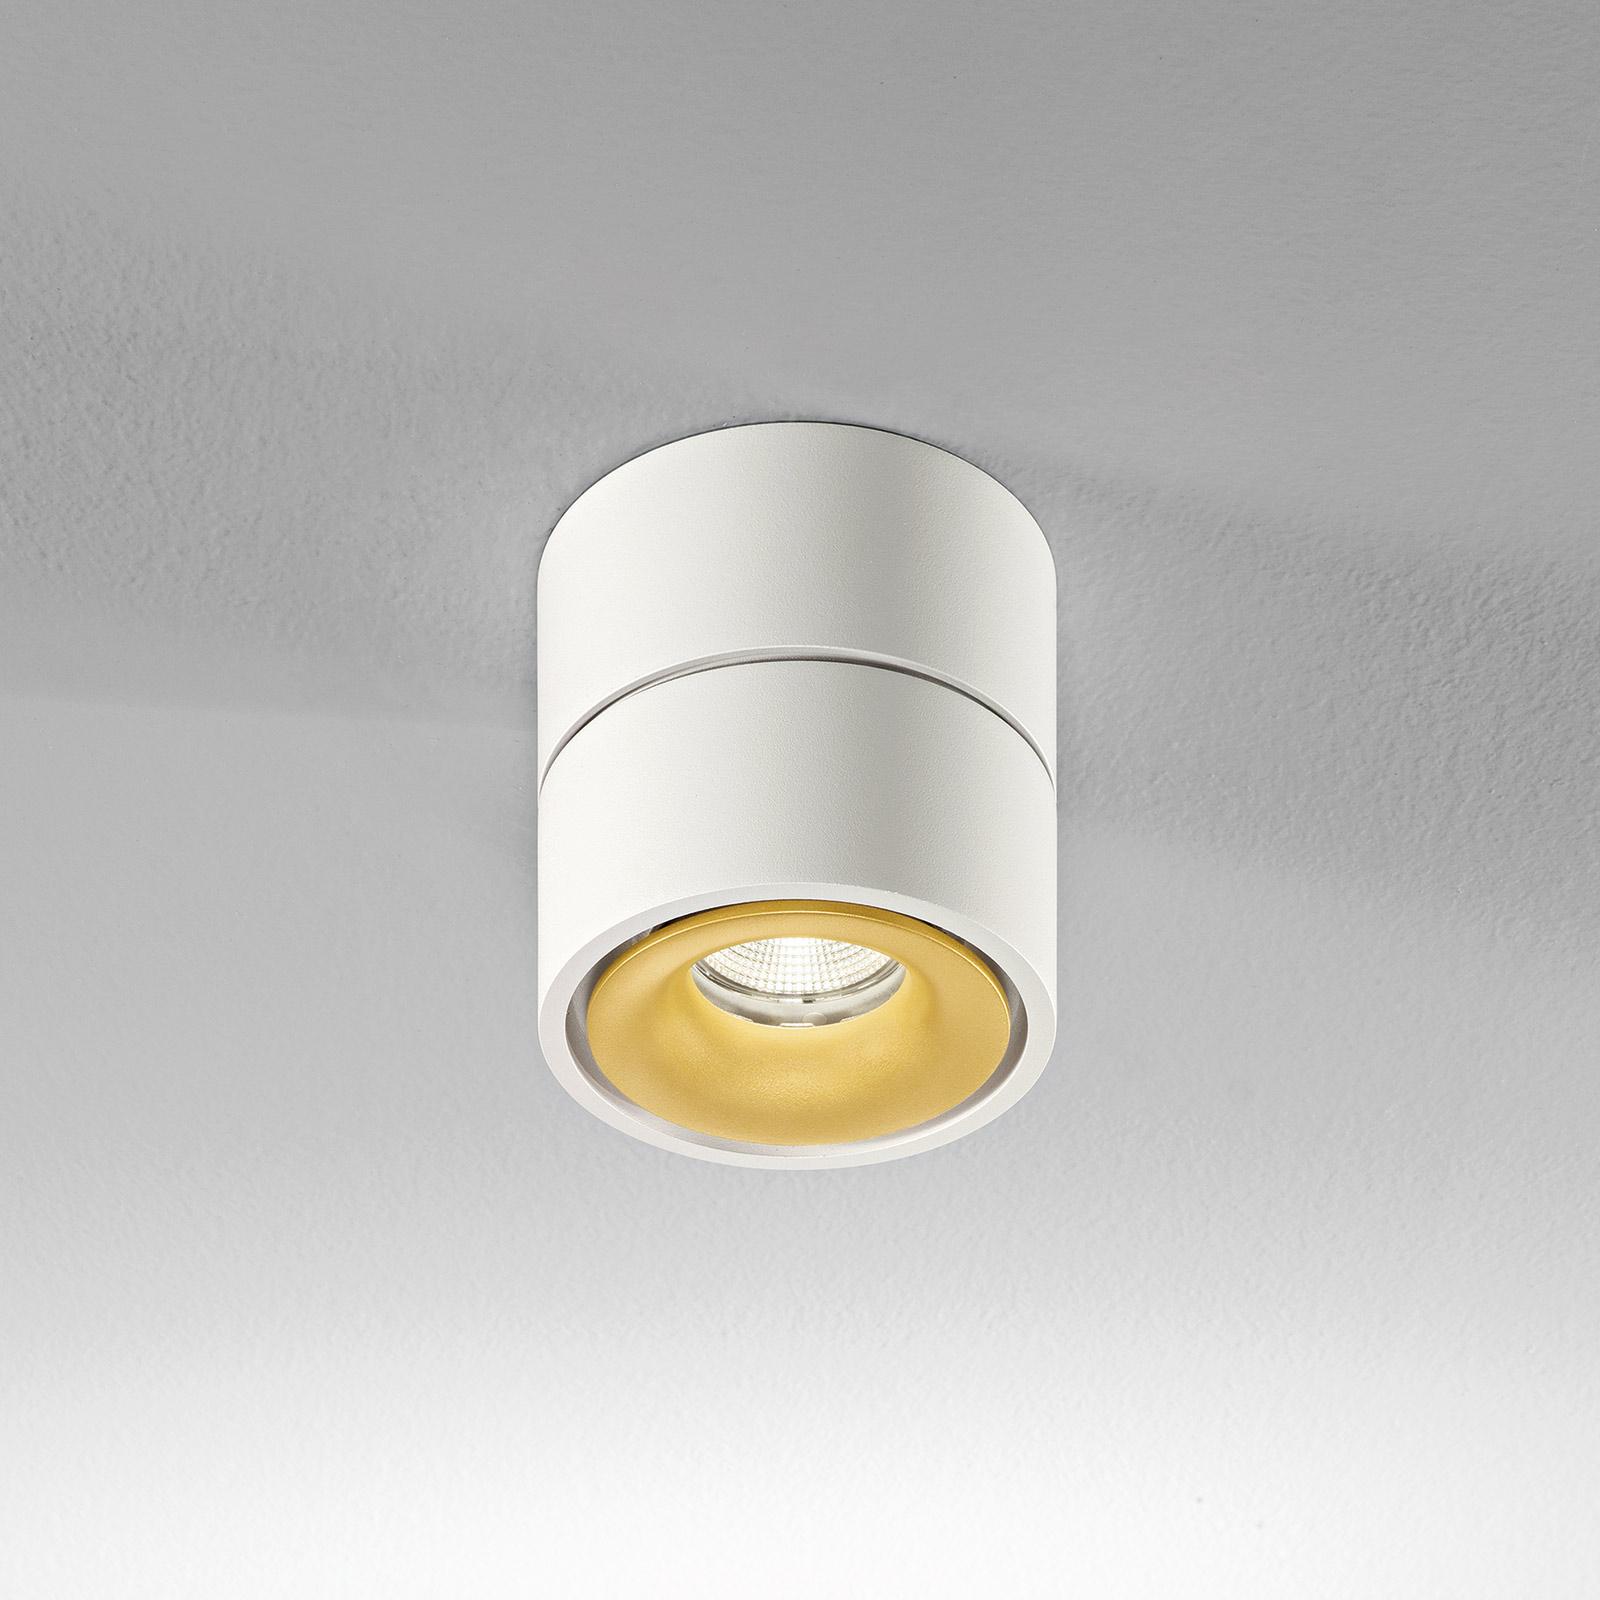 Egger Clippo LED-Deckenspot dim-to-warm weiß/gold